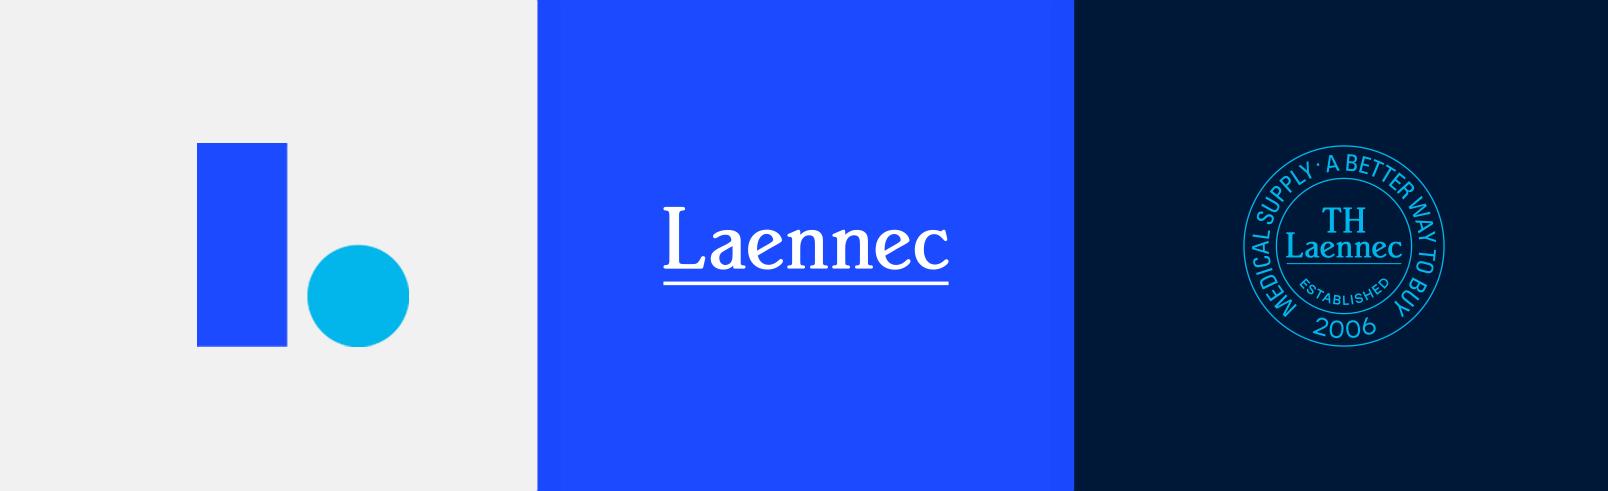 2-logo-1